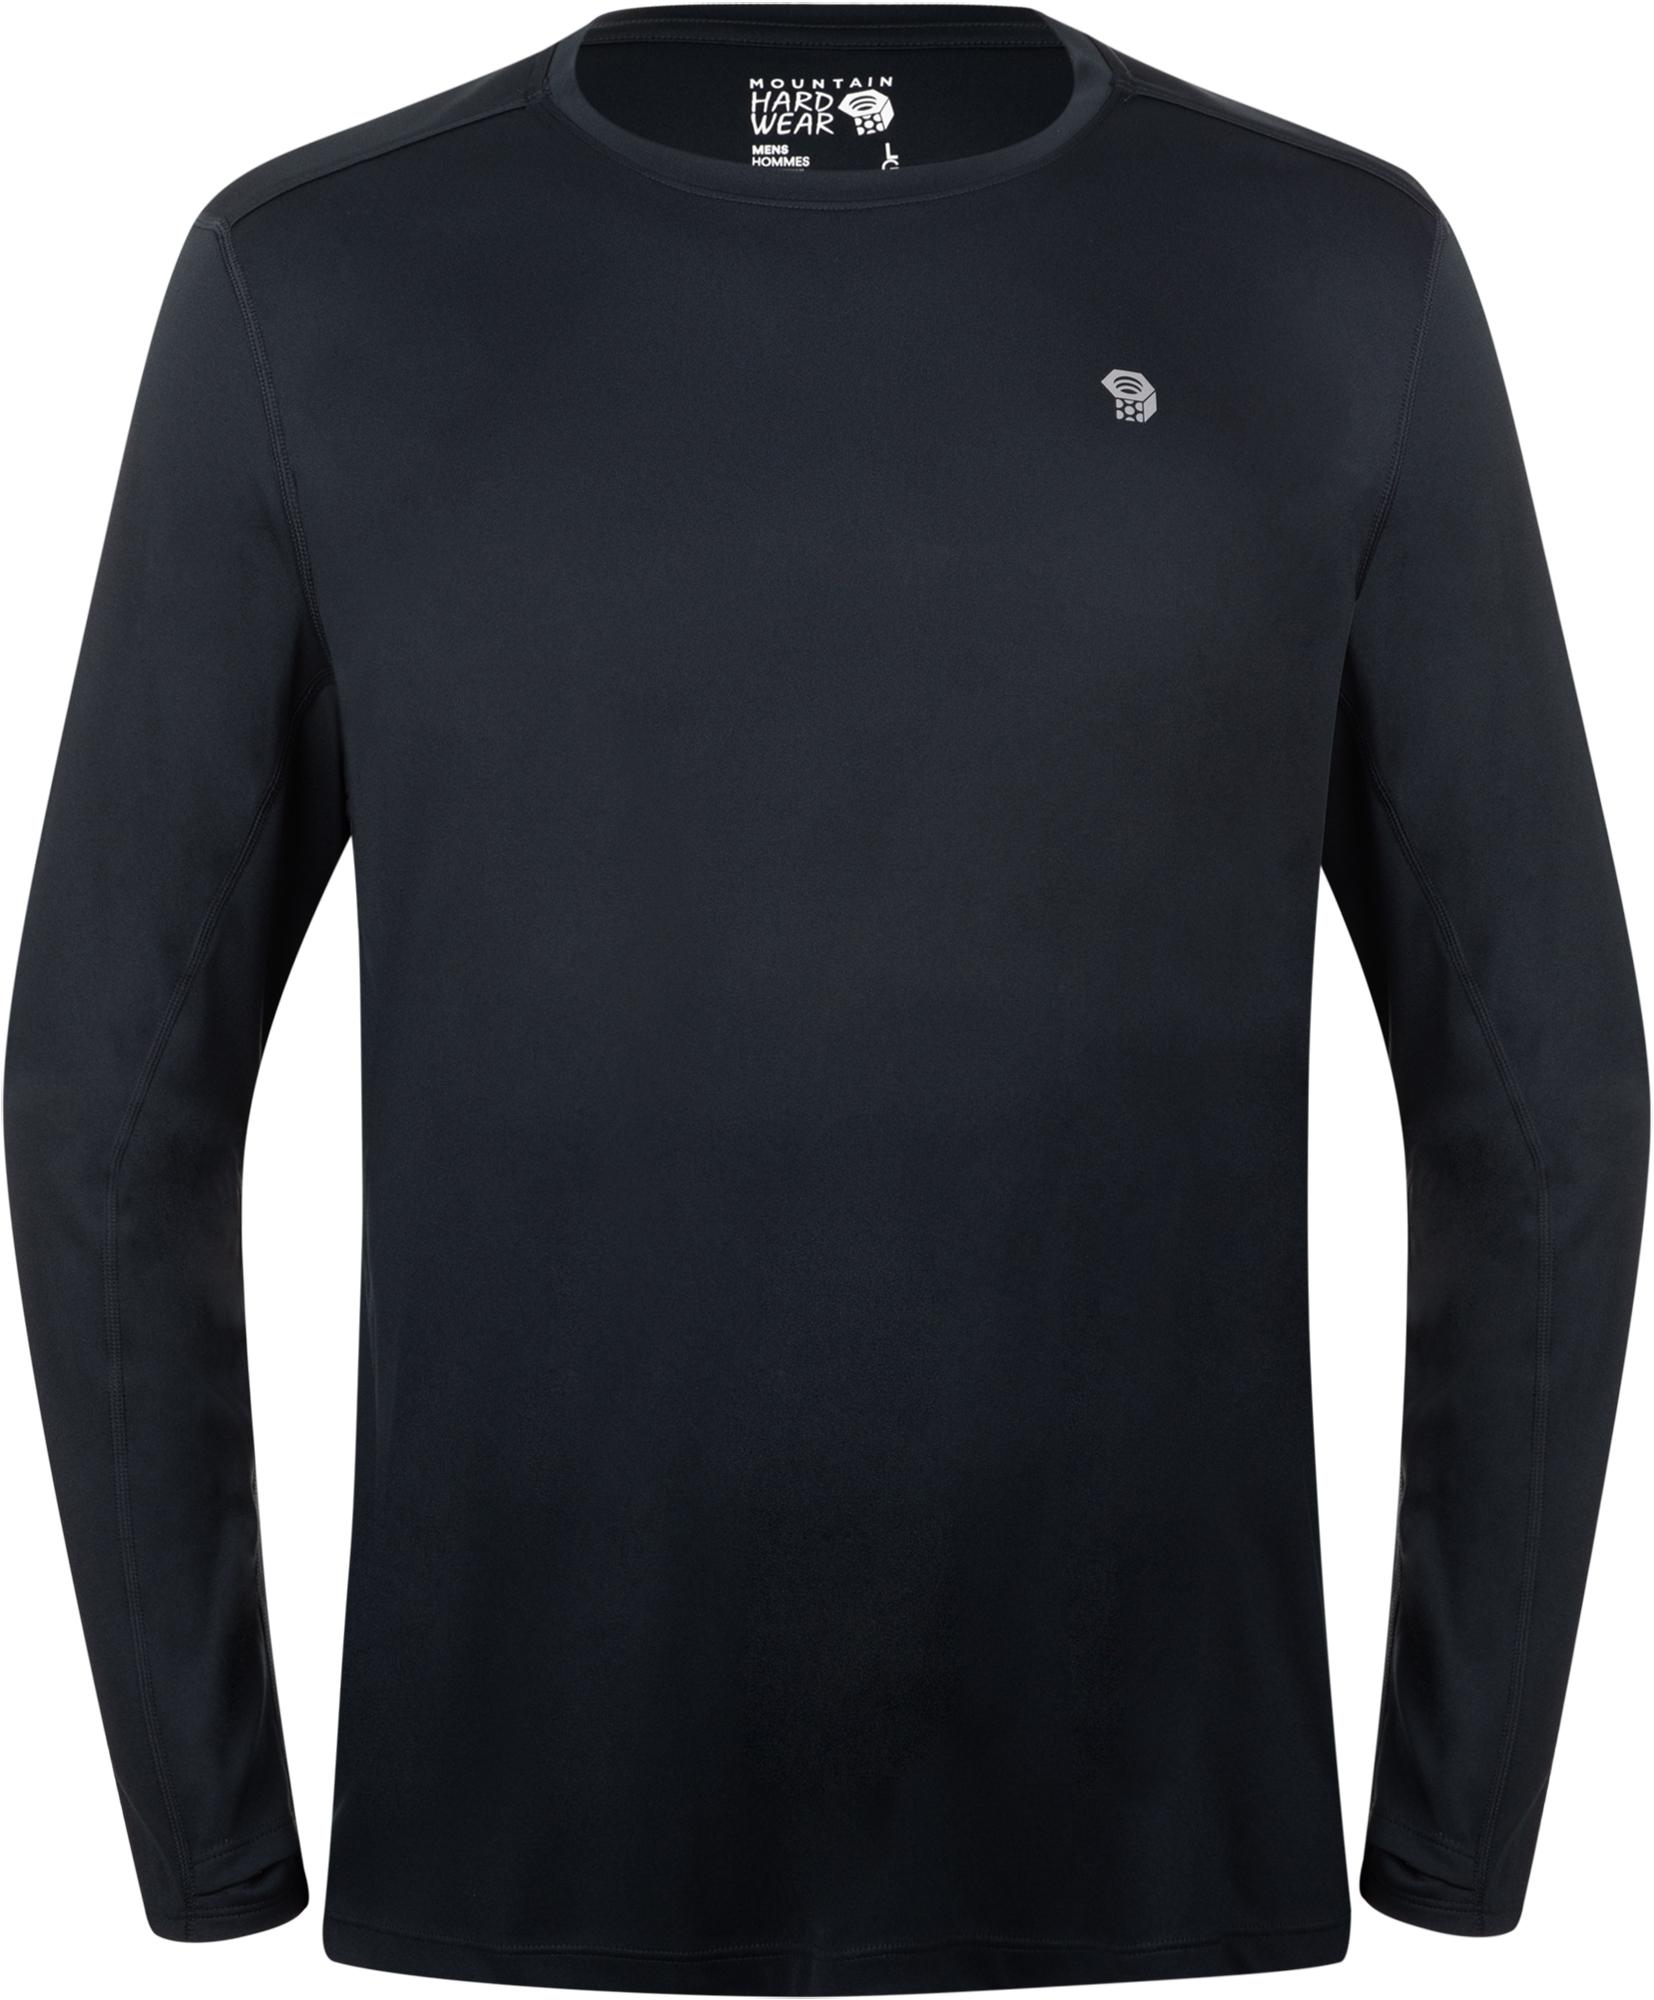 цена на Mountain Hardwear Лонгслив мужской Mountain Hardwear Wicked Tech™, размер 54